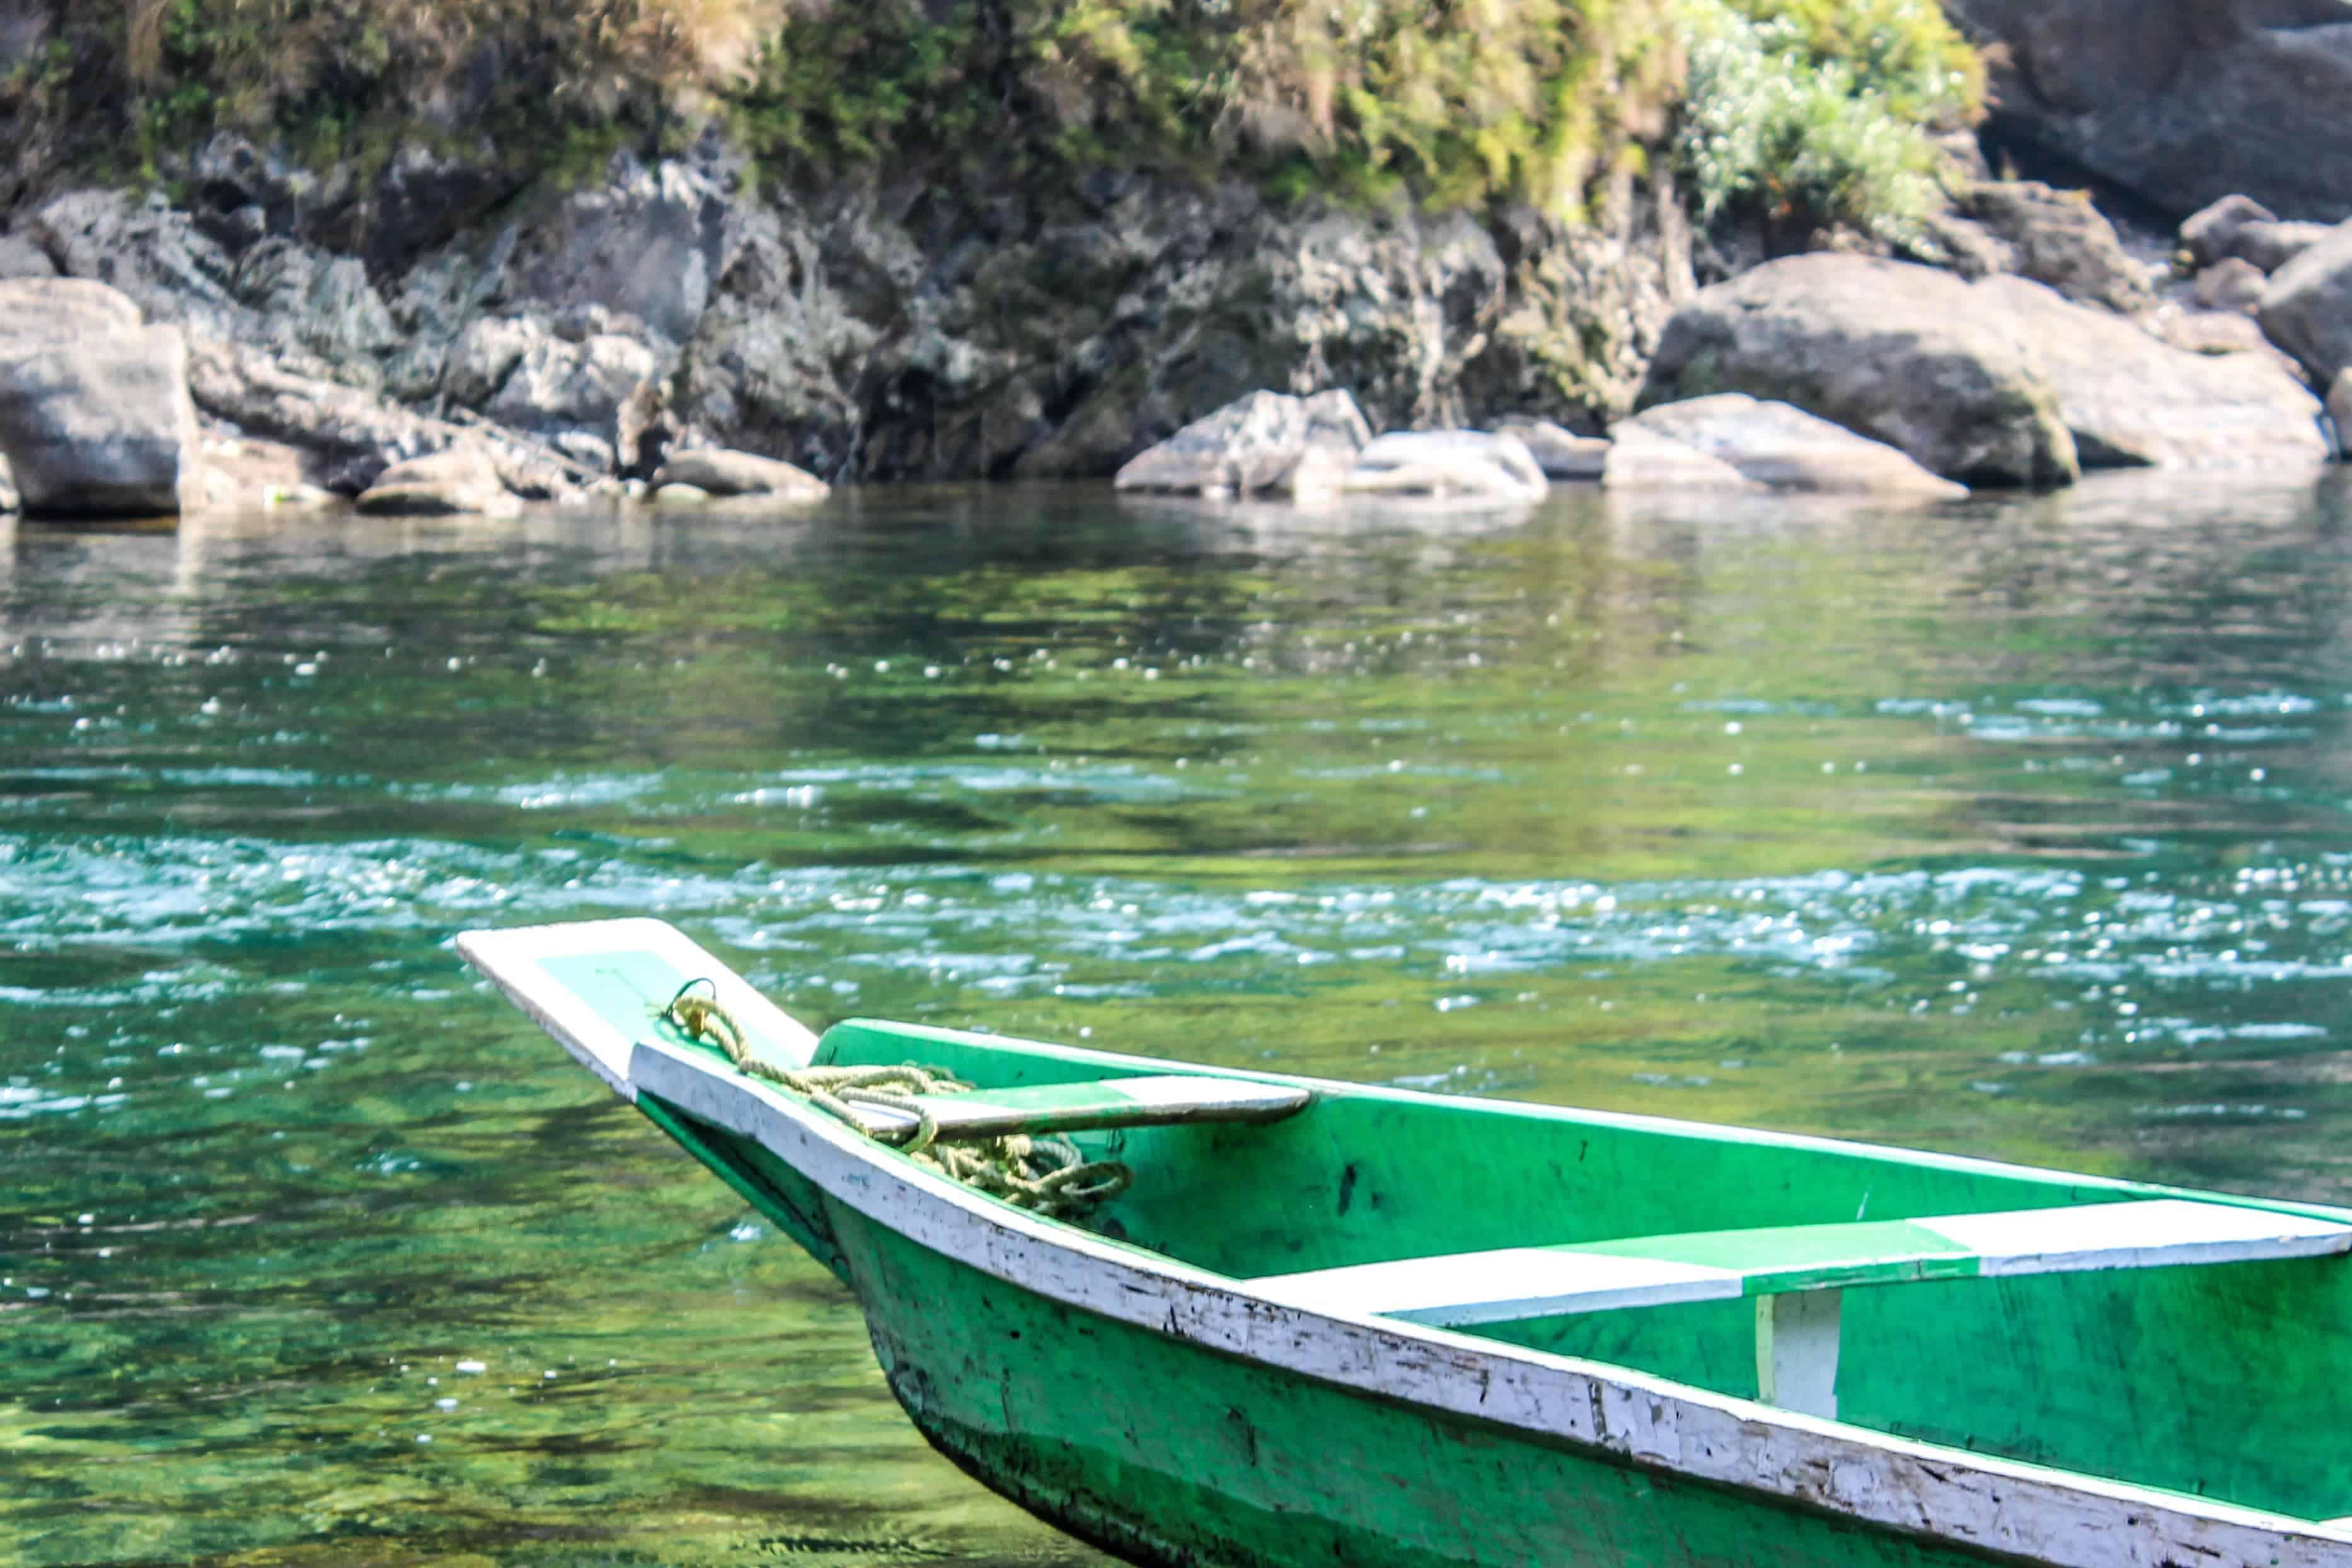 A boat on Umngot River in dawki